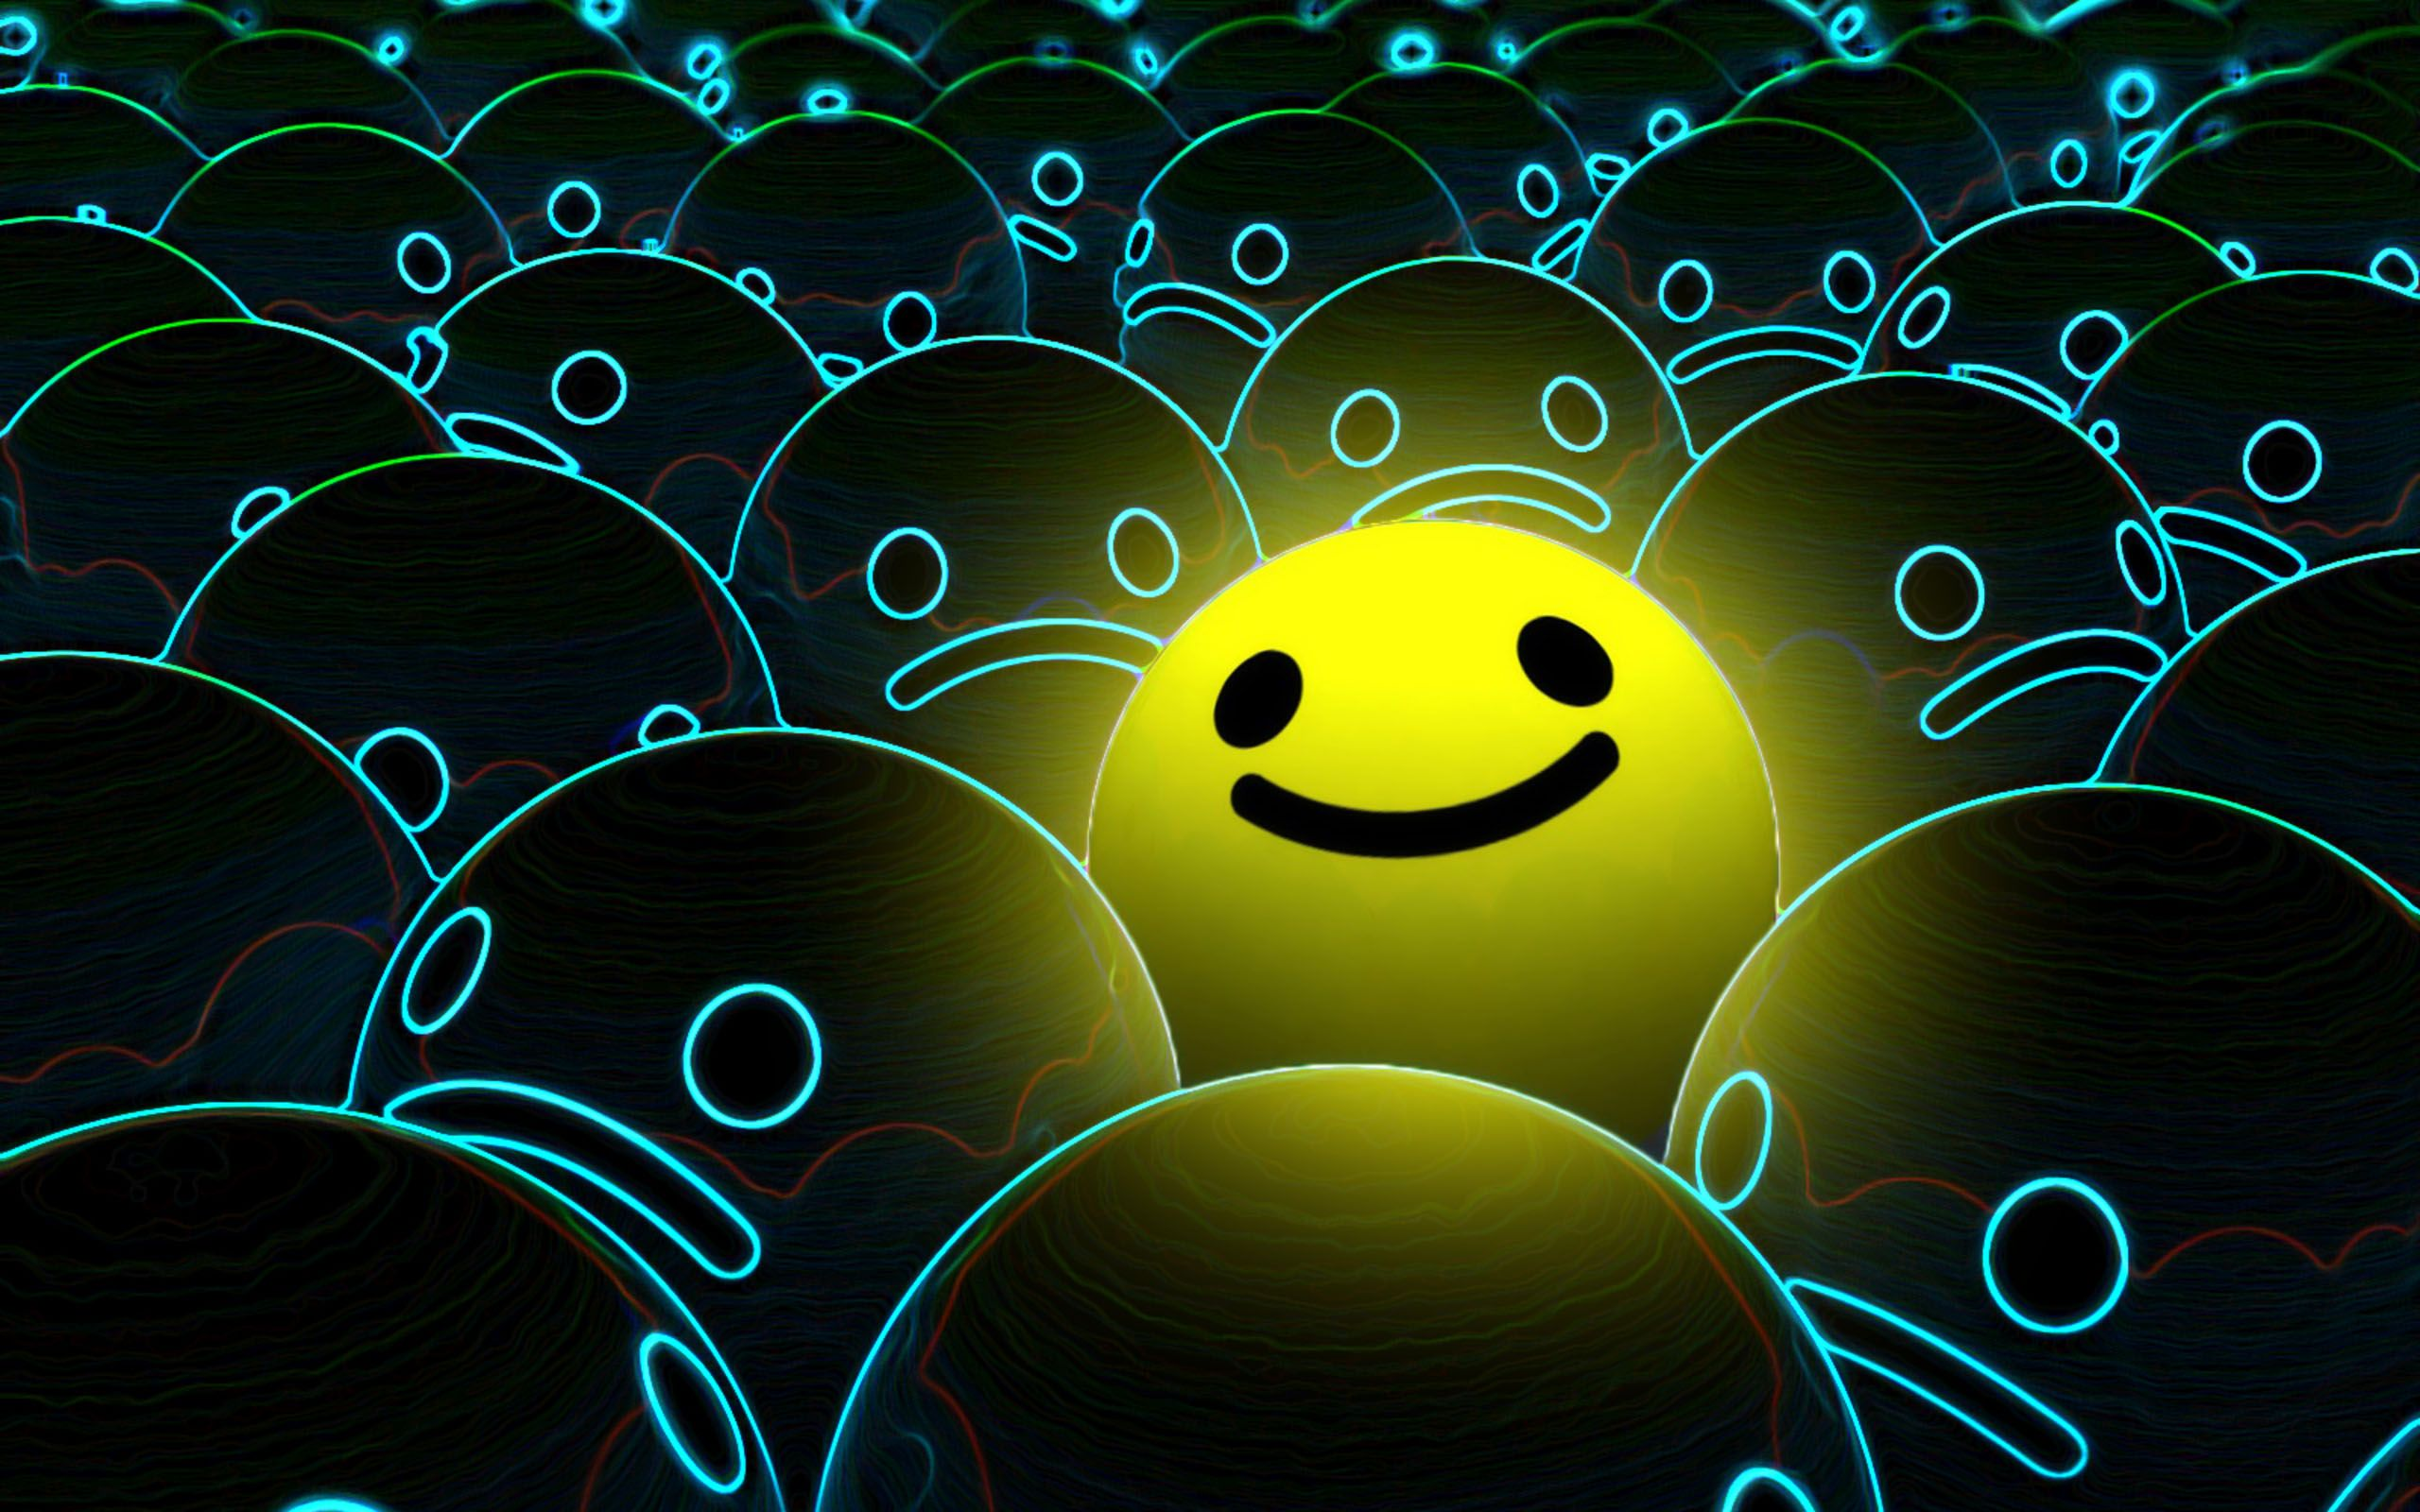 Pin By Happy Angle Osama On S M I L E Happy Wallpaper Smiley Joy And Happiness